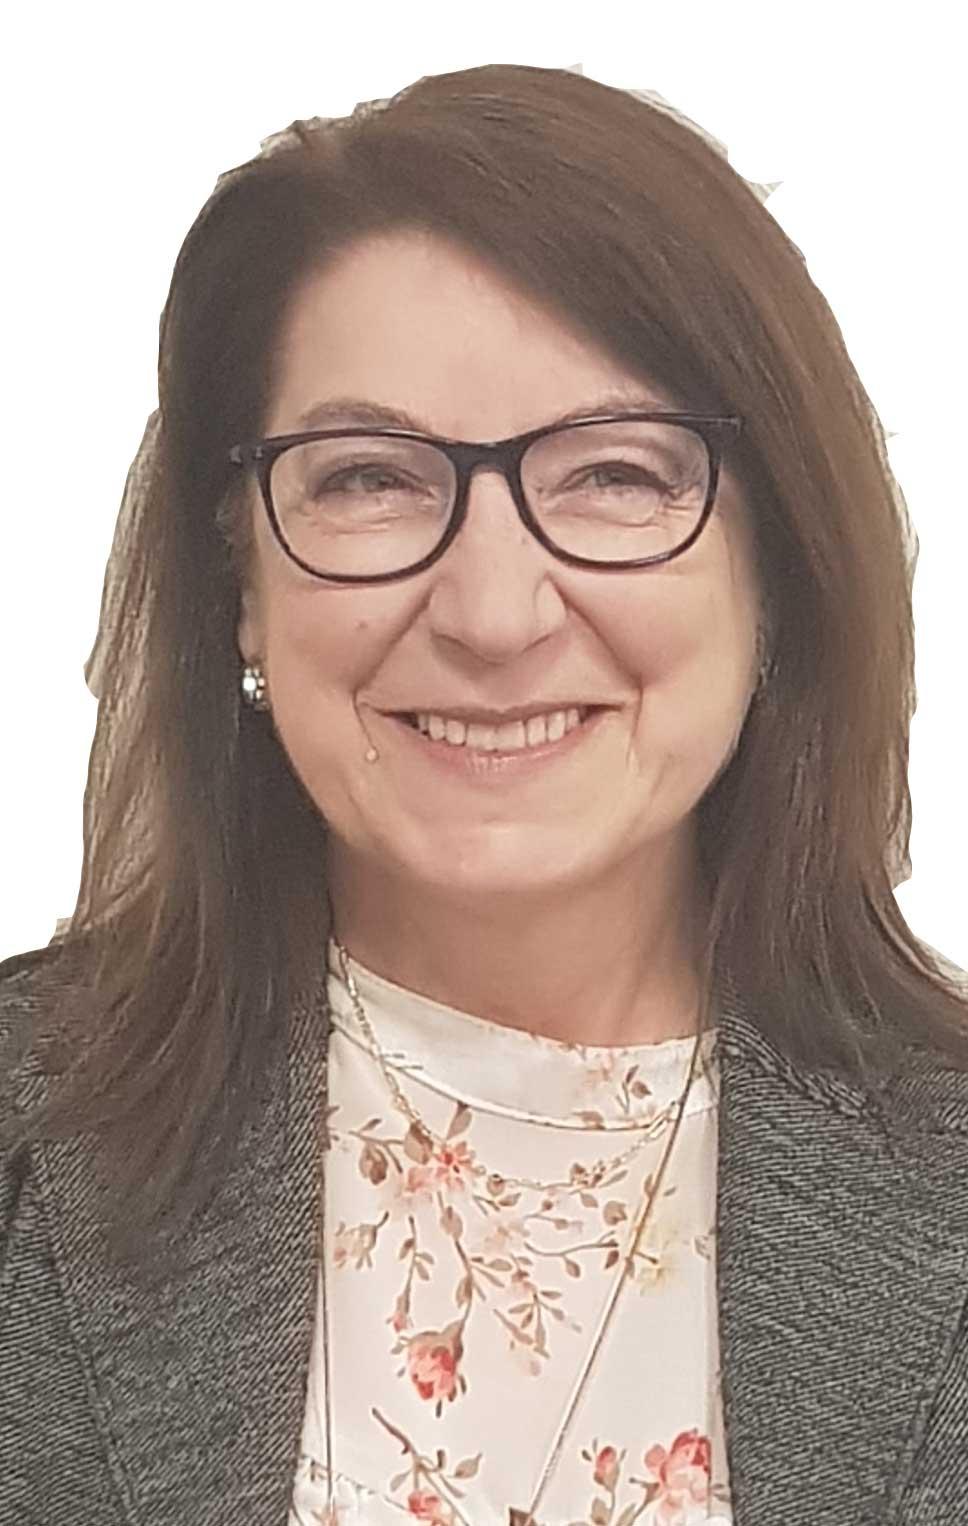 María Dolores Álvarez Gómez